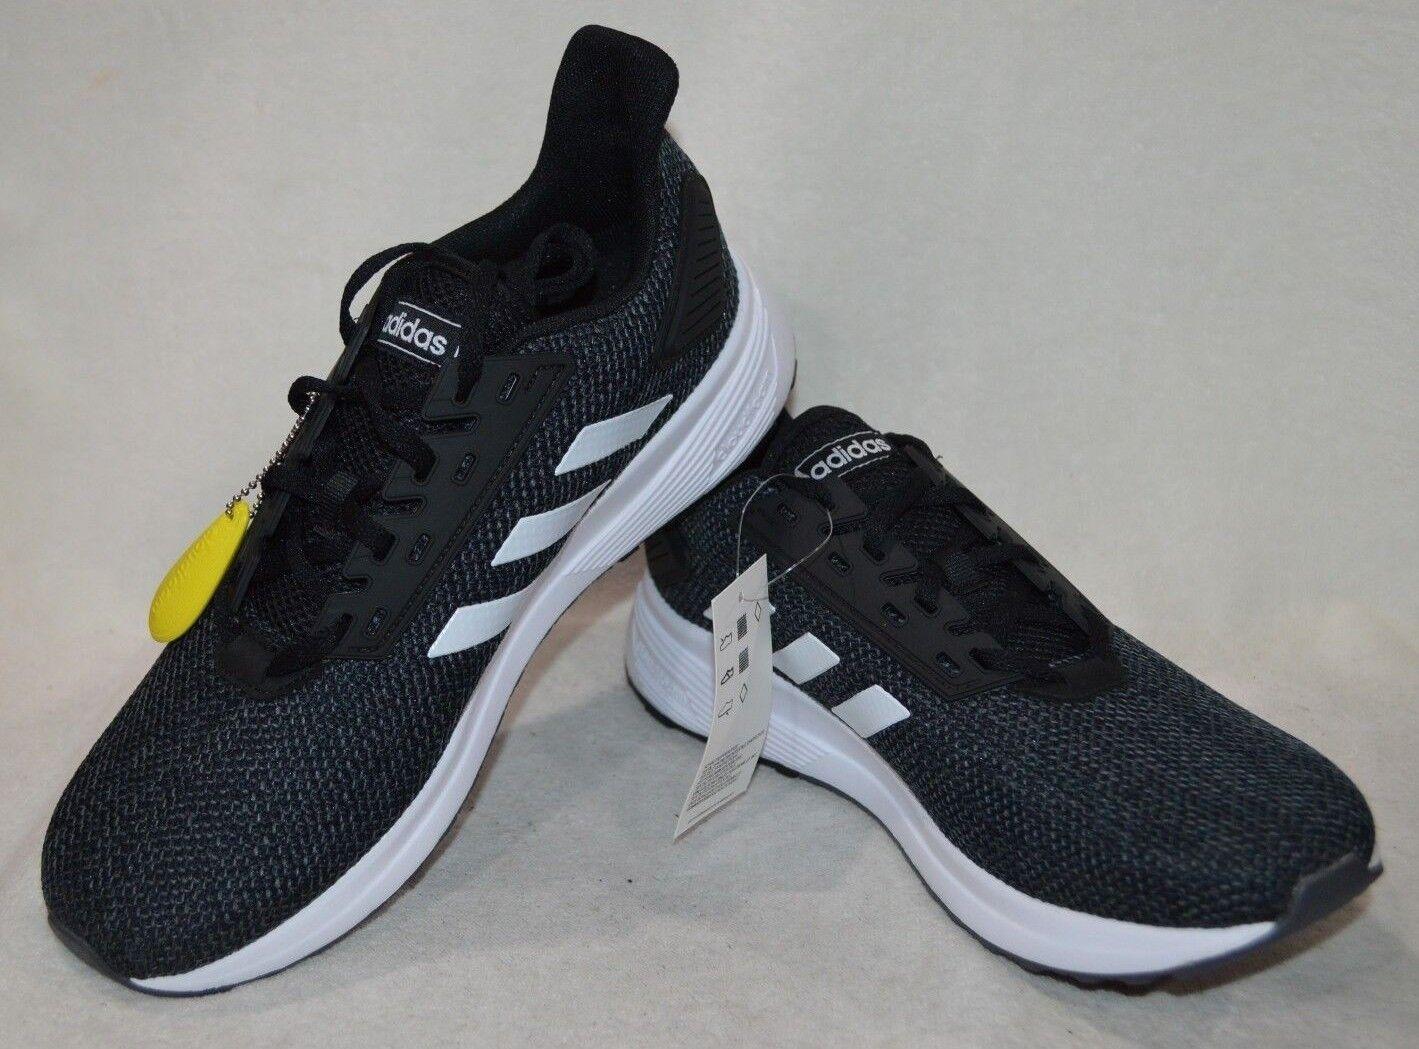 Adidas Femmes Duramo 9 noir blanc Chaussures de Course-Tailles Assorties Neuf avec boîte F35281